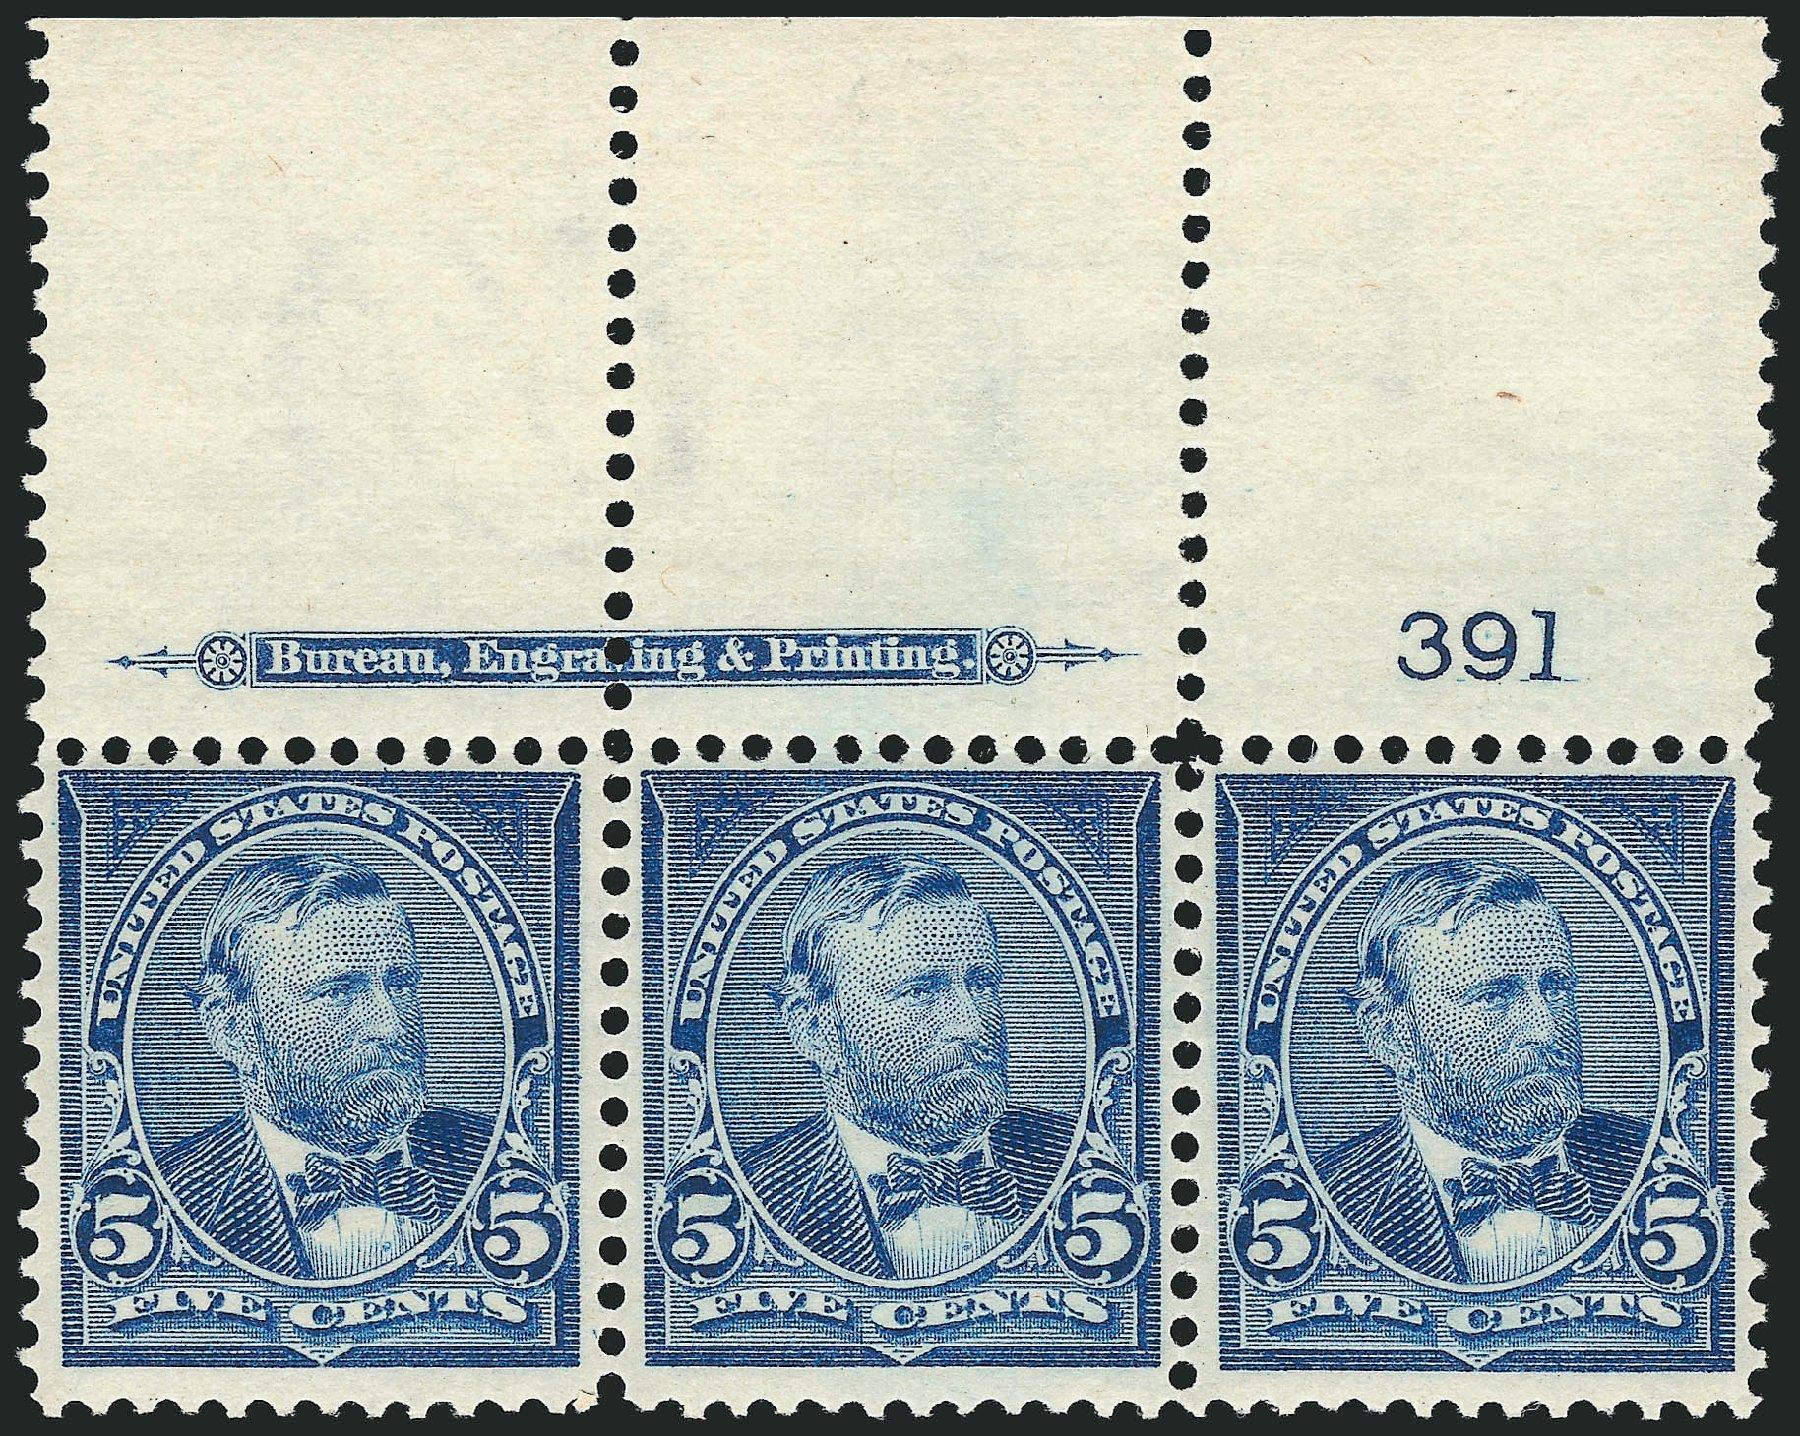 US Stamp Value Scott Cat. 281: 1898 5c Grant. Robert Siegel Auction Galleries, Mar 2012, Sale 1019, Lot 614